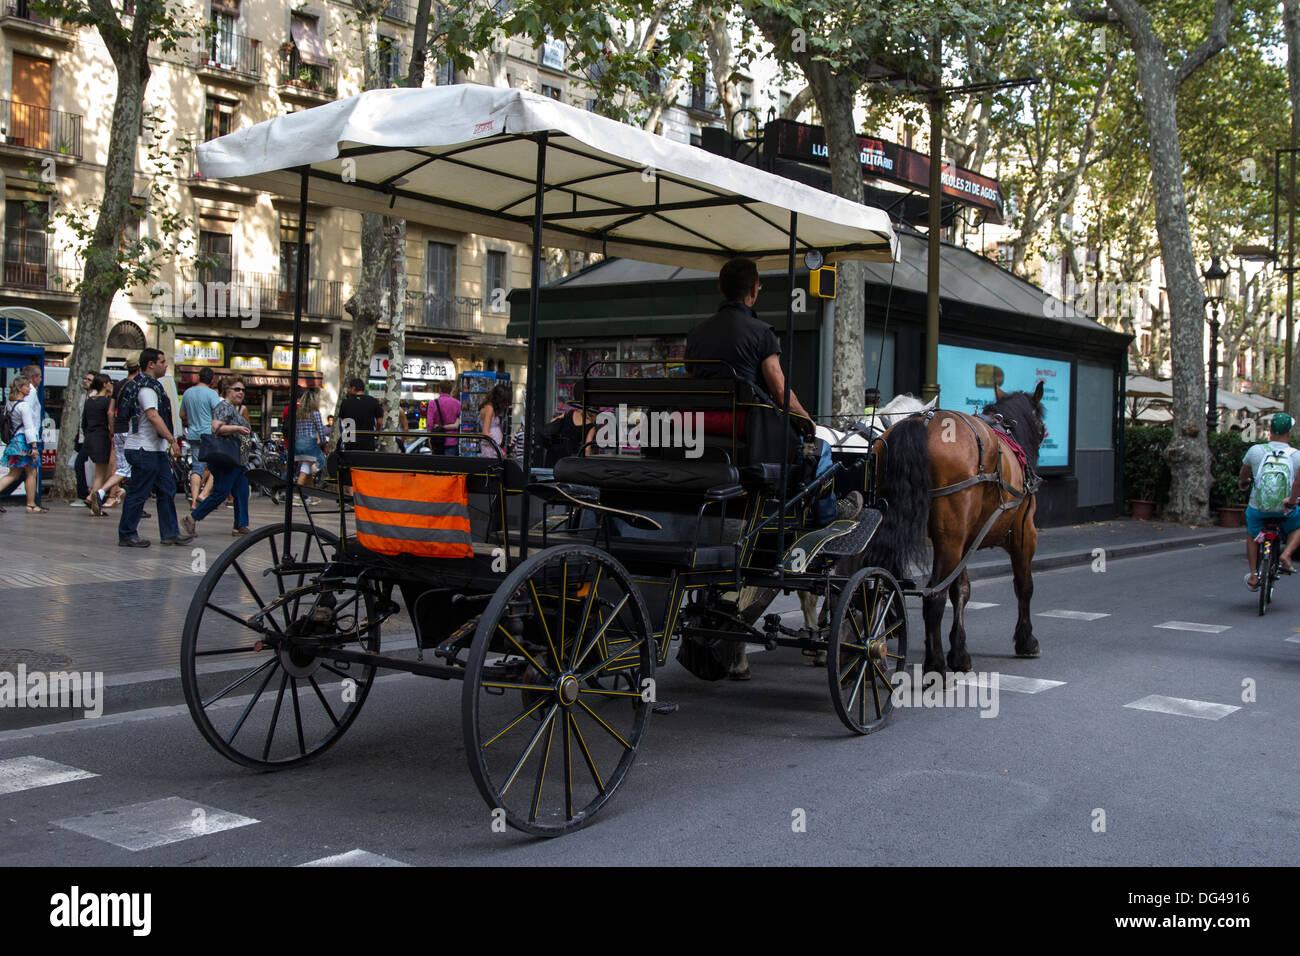 Horse Carriage on La Rambla - Stock Image